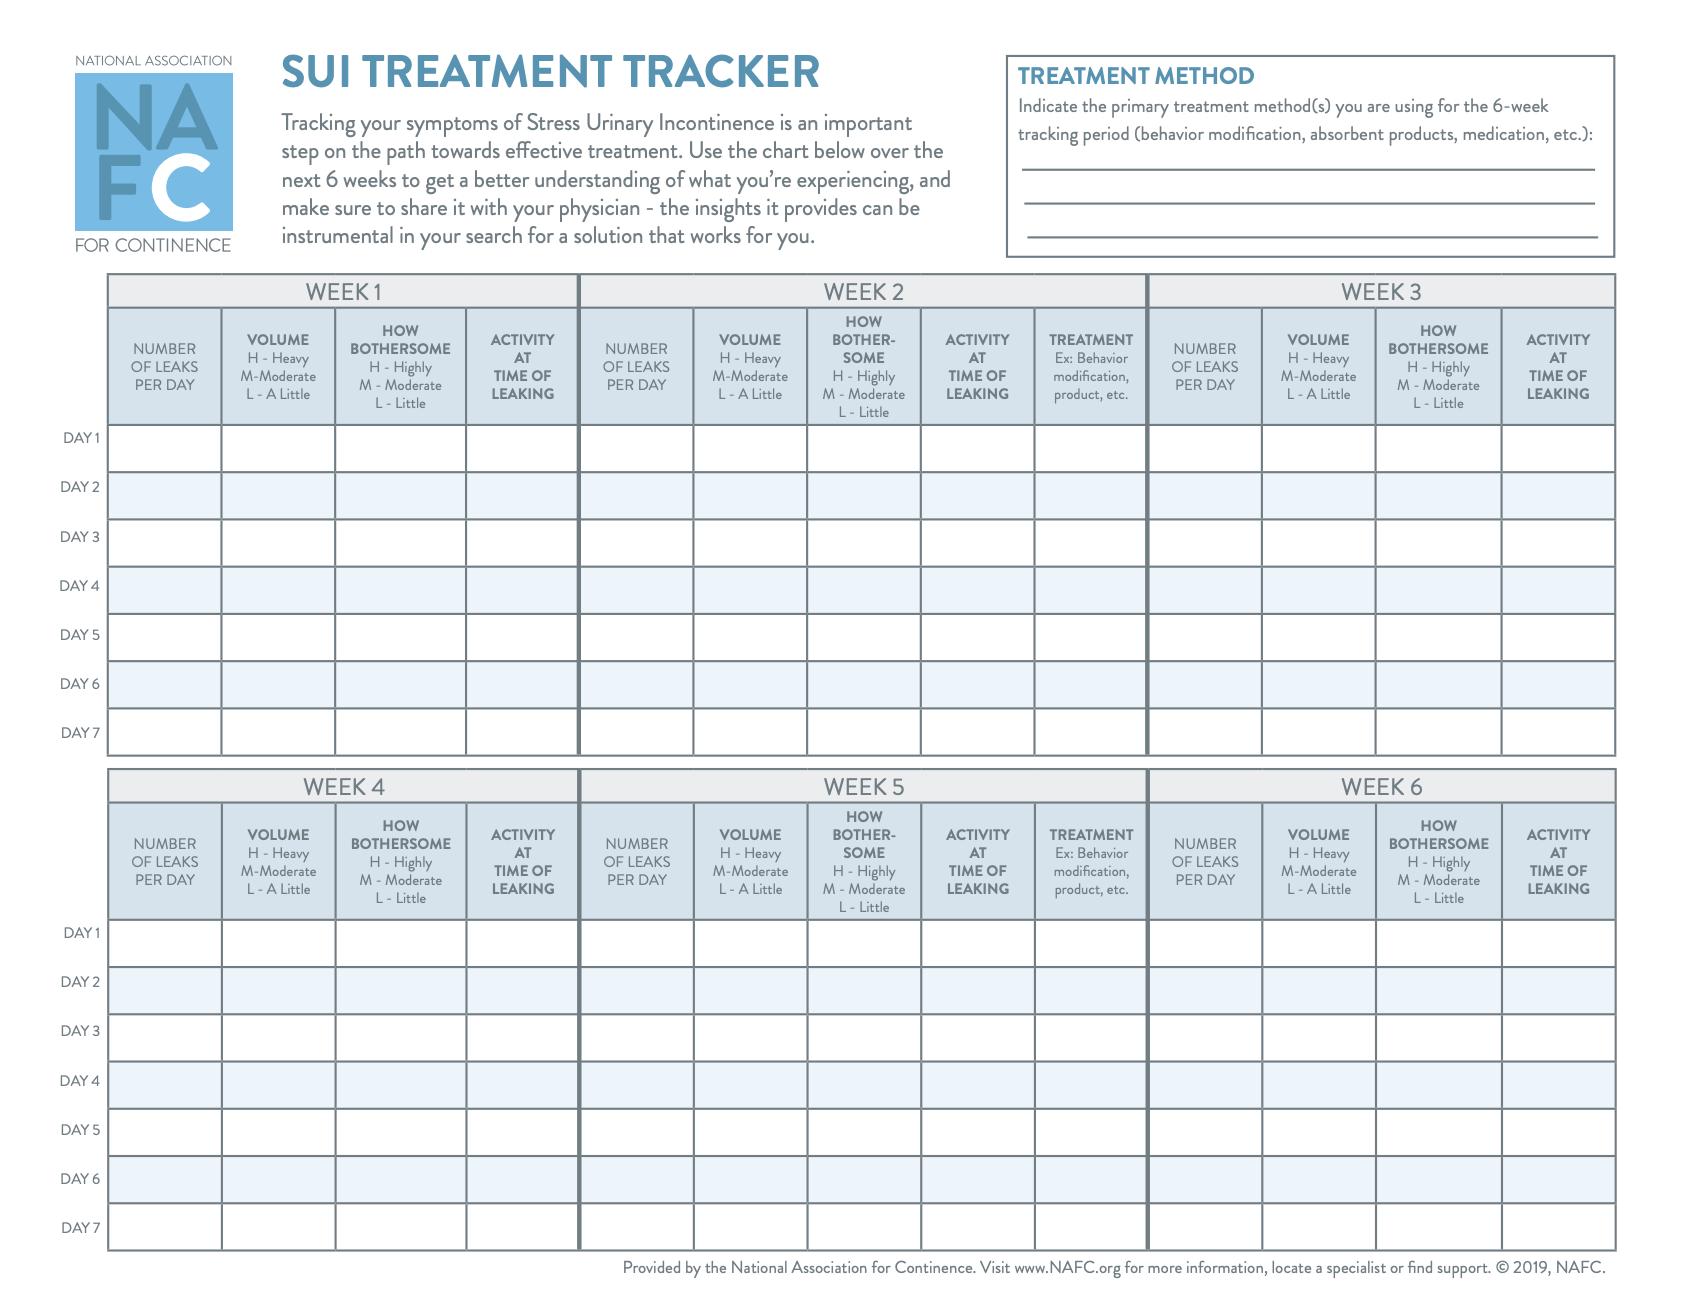 SUI TReatment Tracker